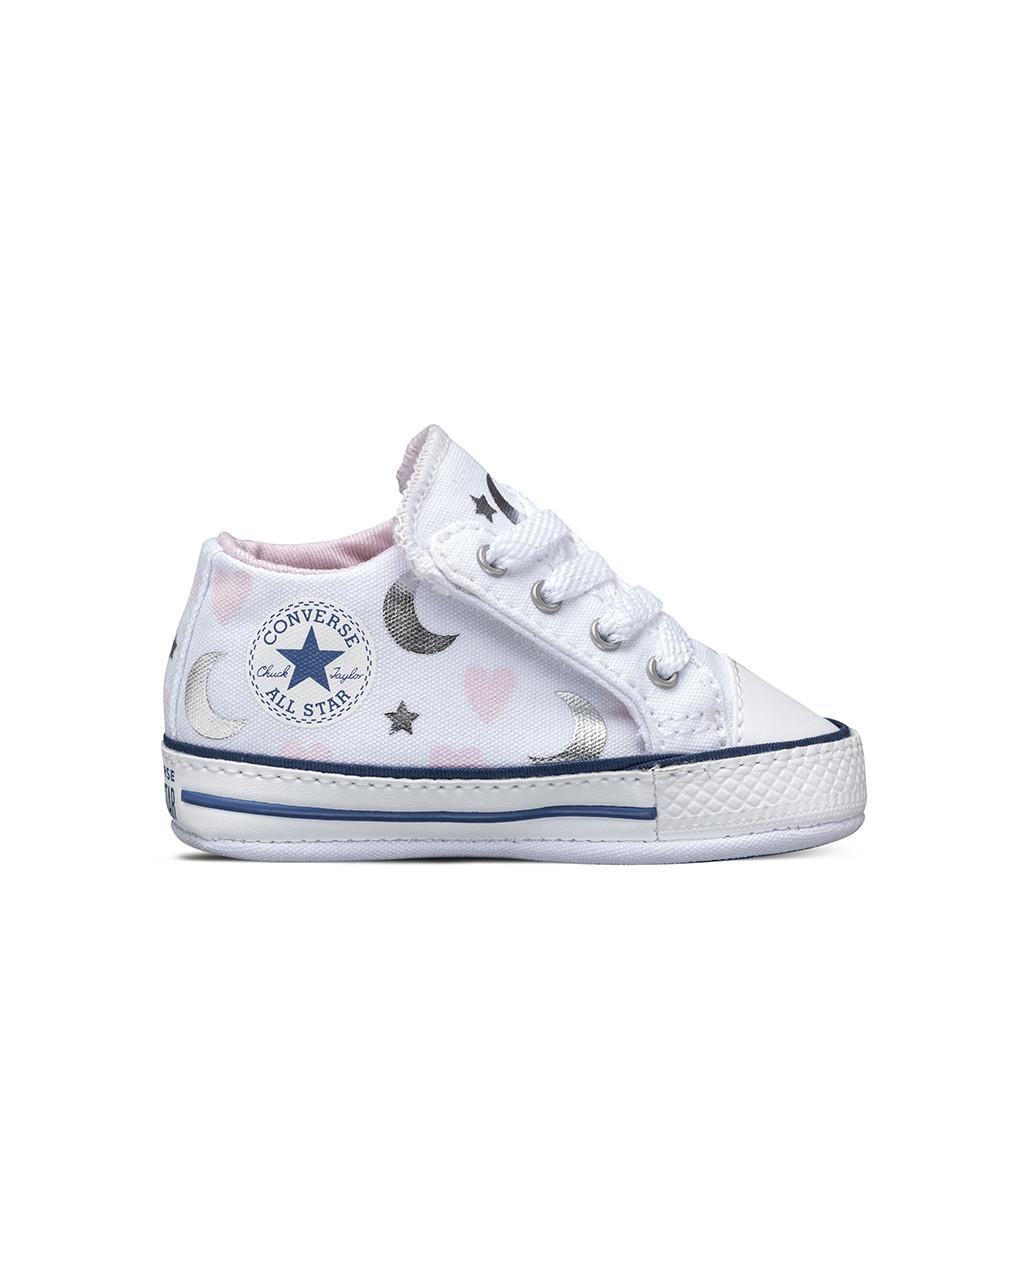 Converse - chuck taylor cribster - Converse